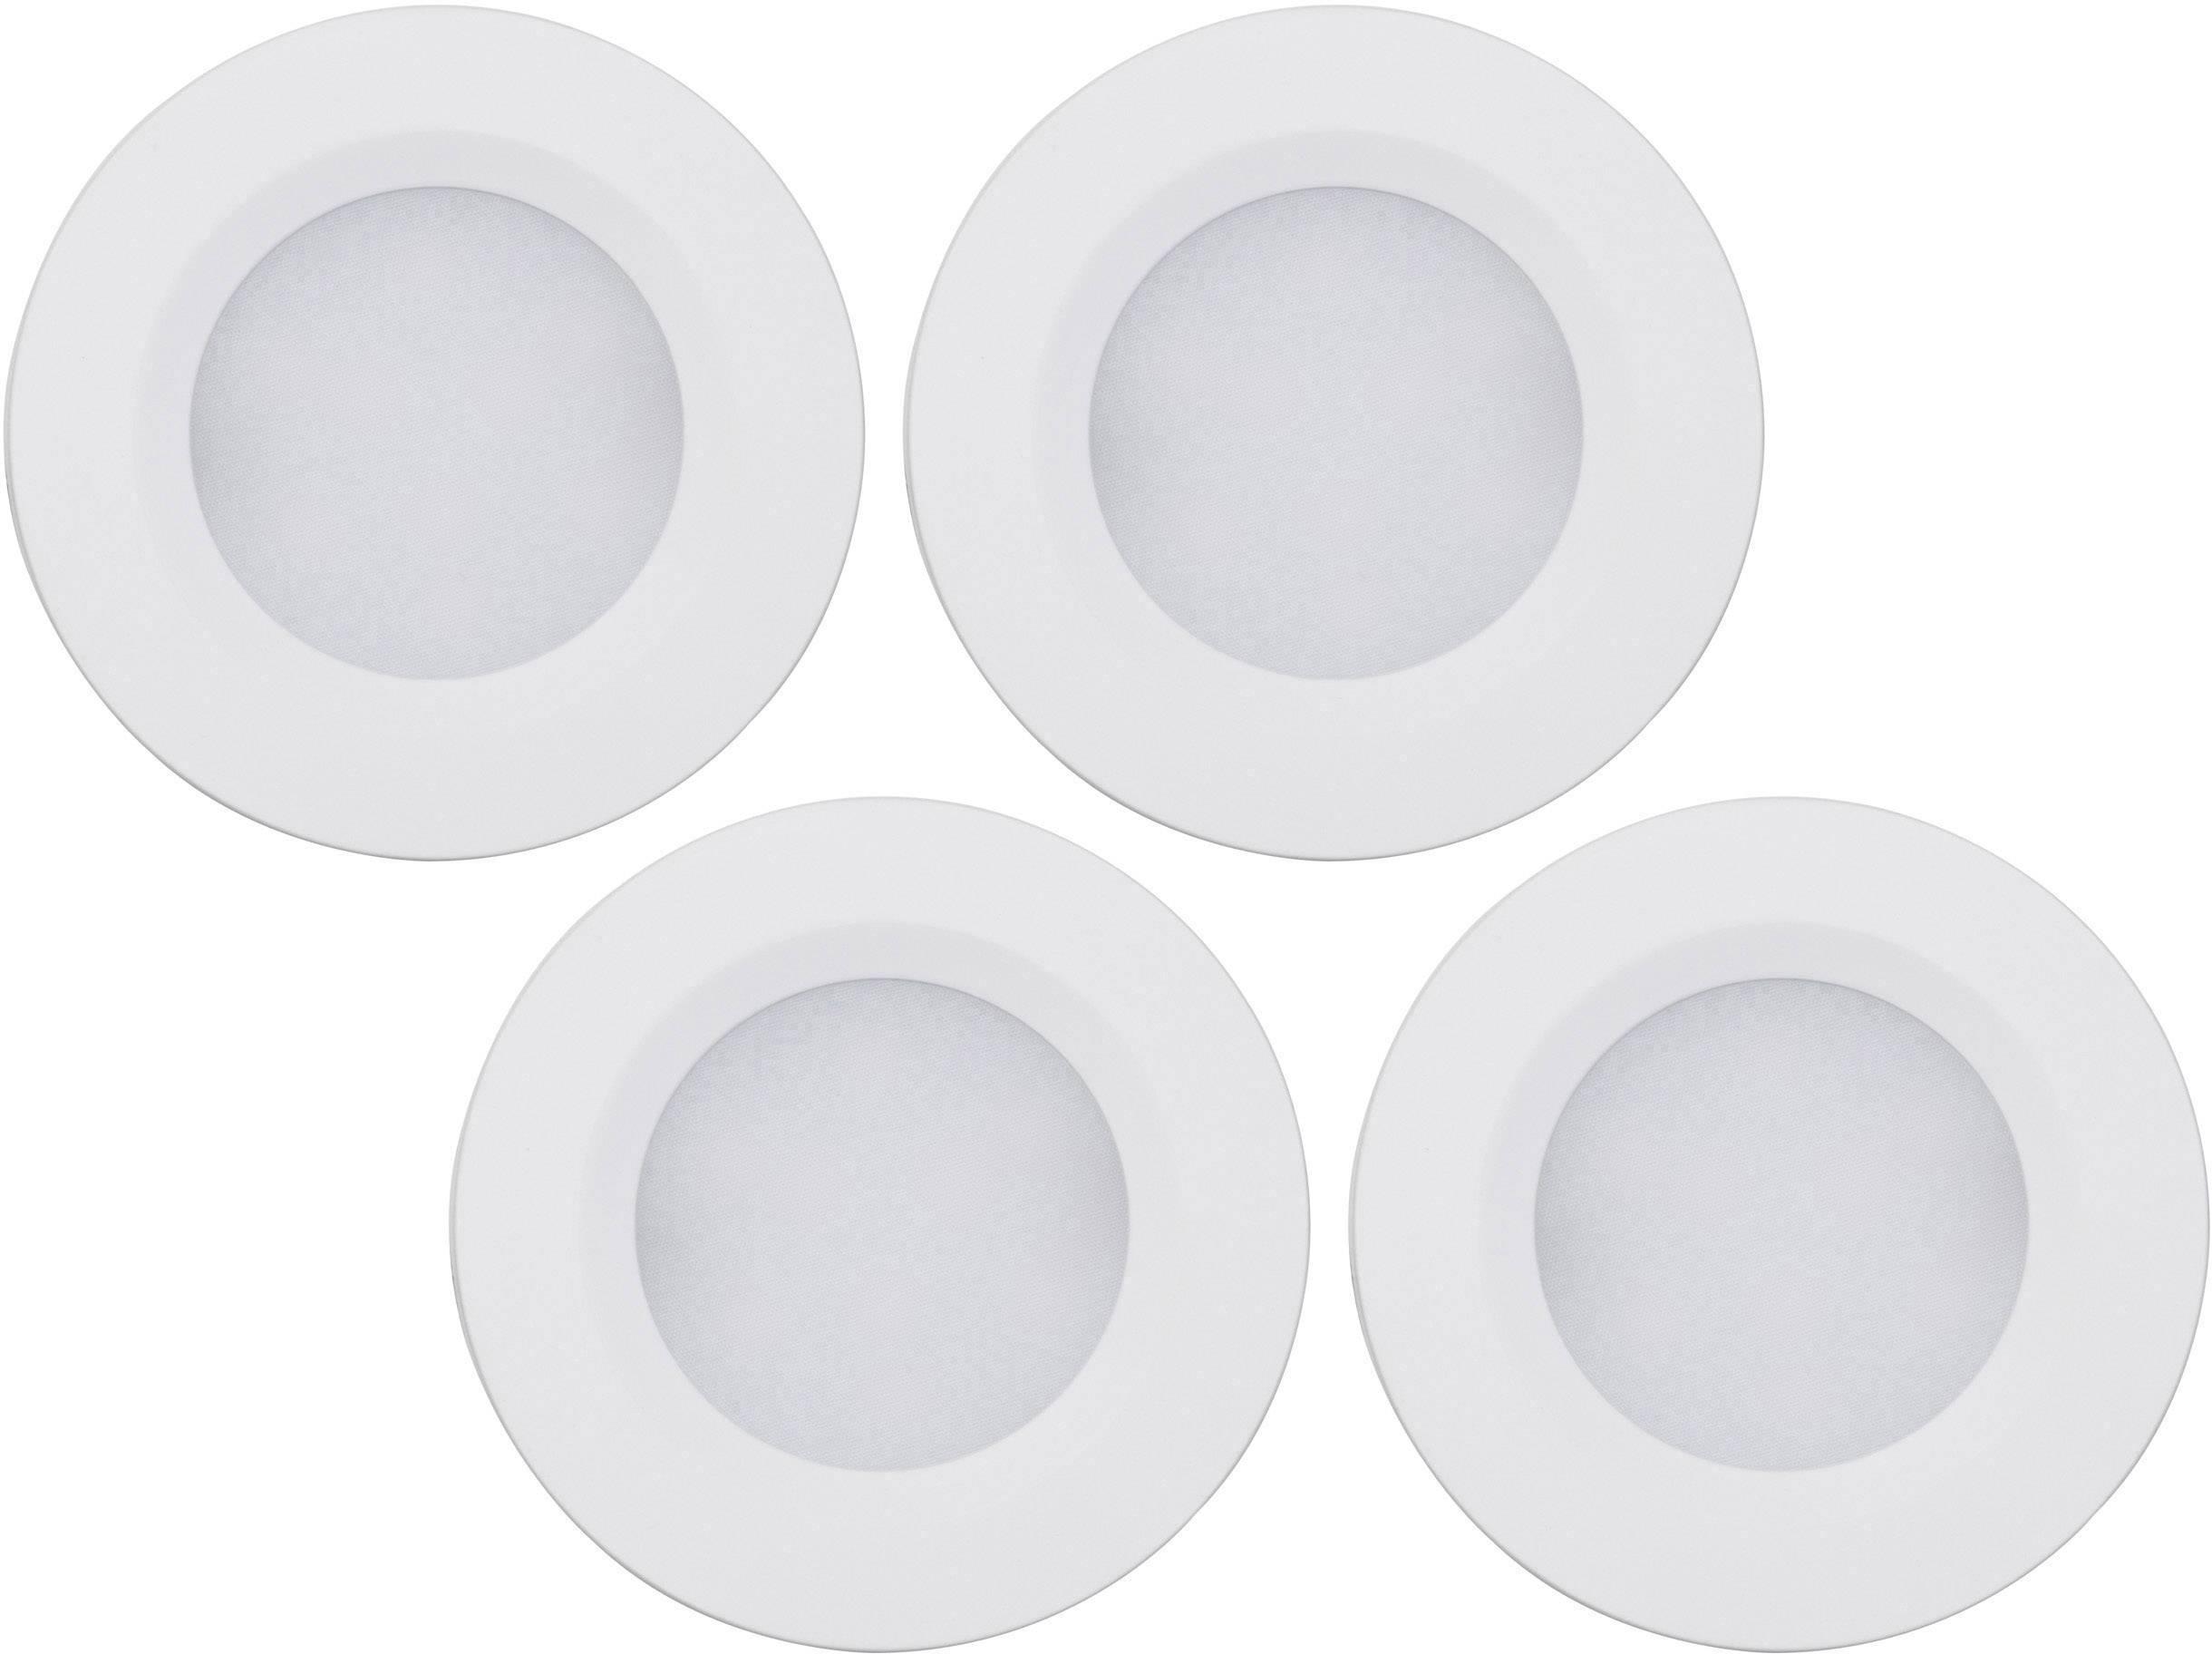 LED osvetlenie na stenu / strop Müller Licht 400079, 28 W, RGB, biela